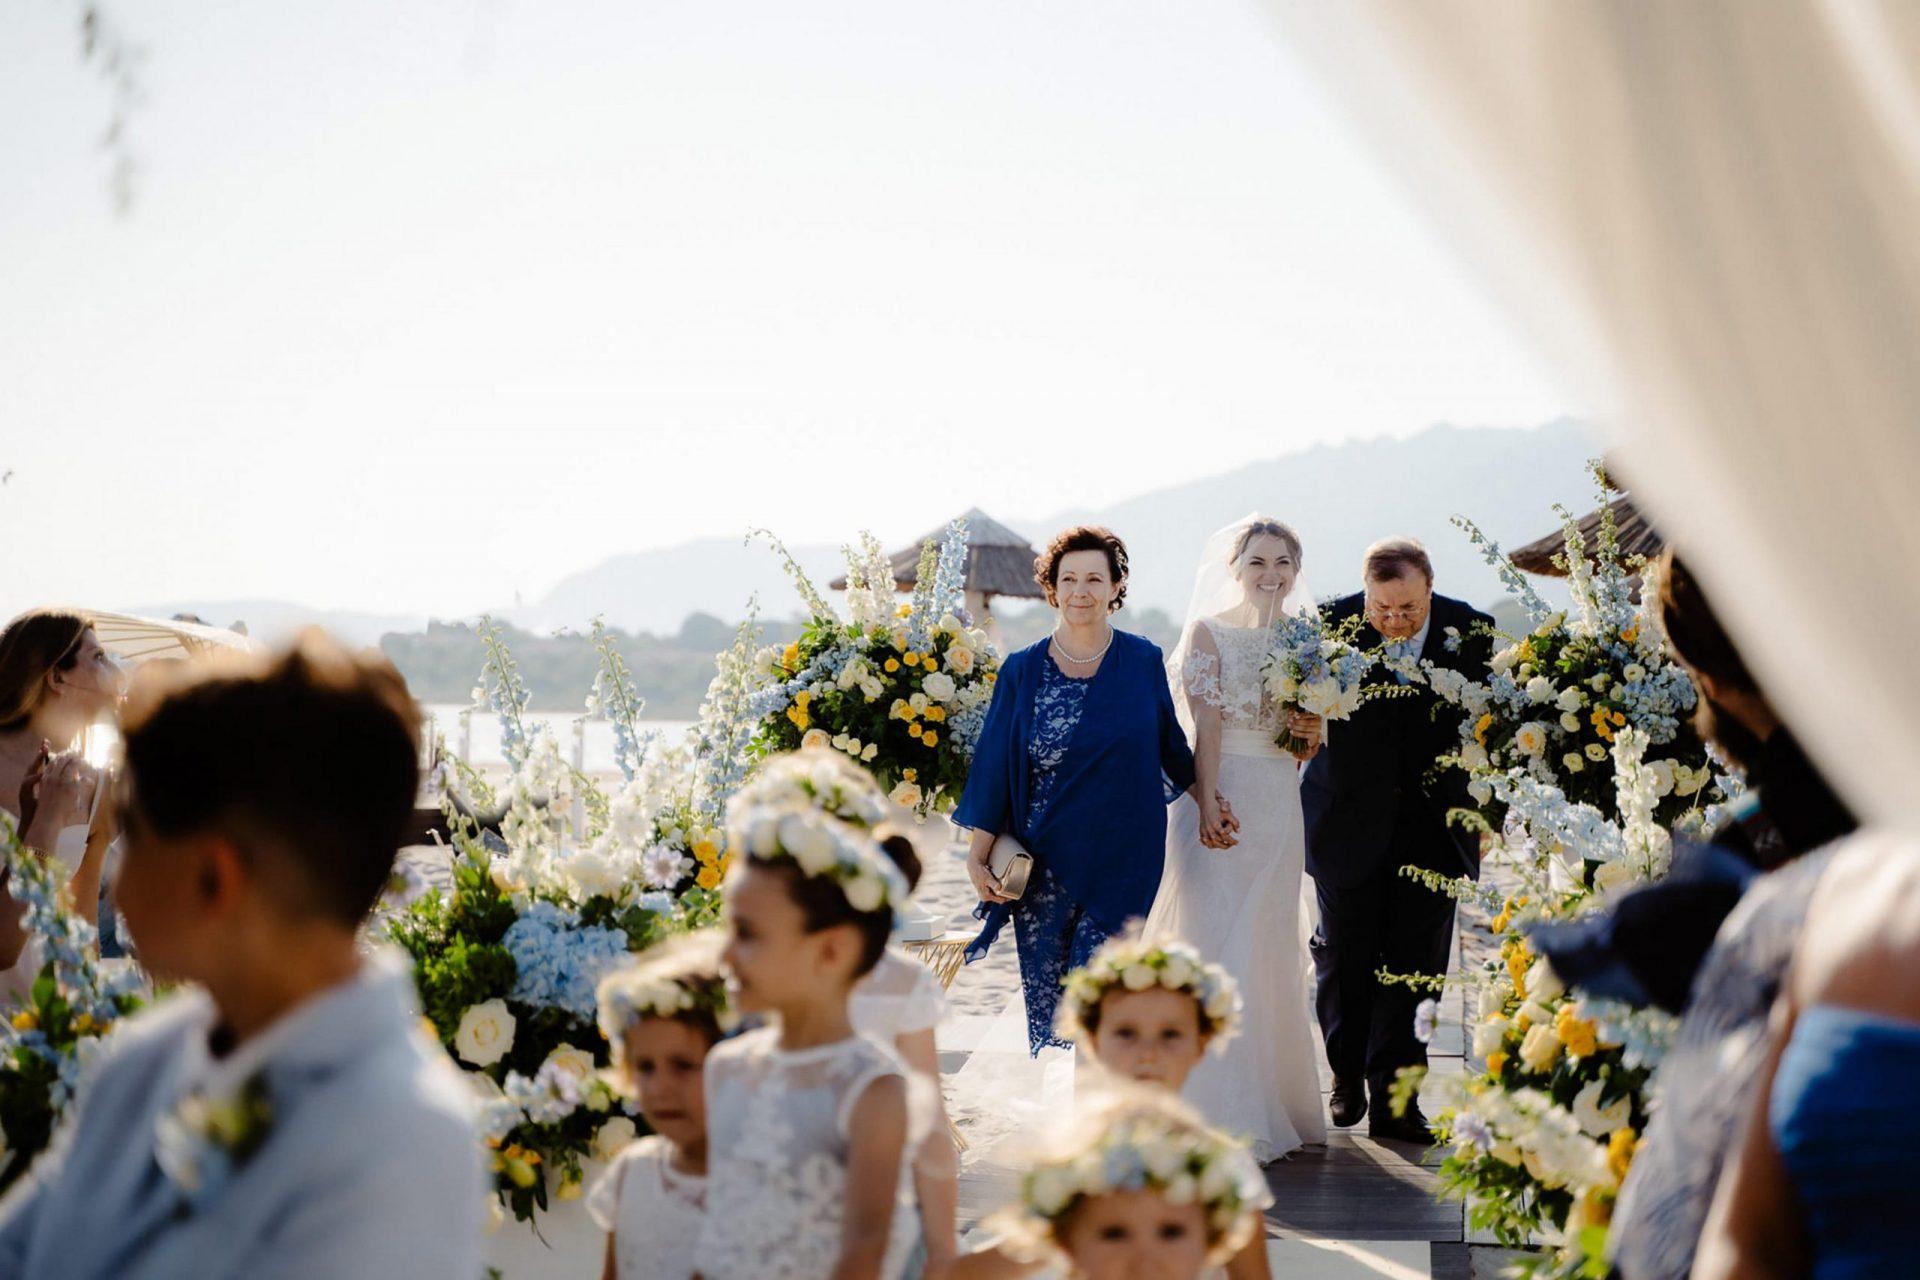 Linda and Enrico, the bride entrance